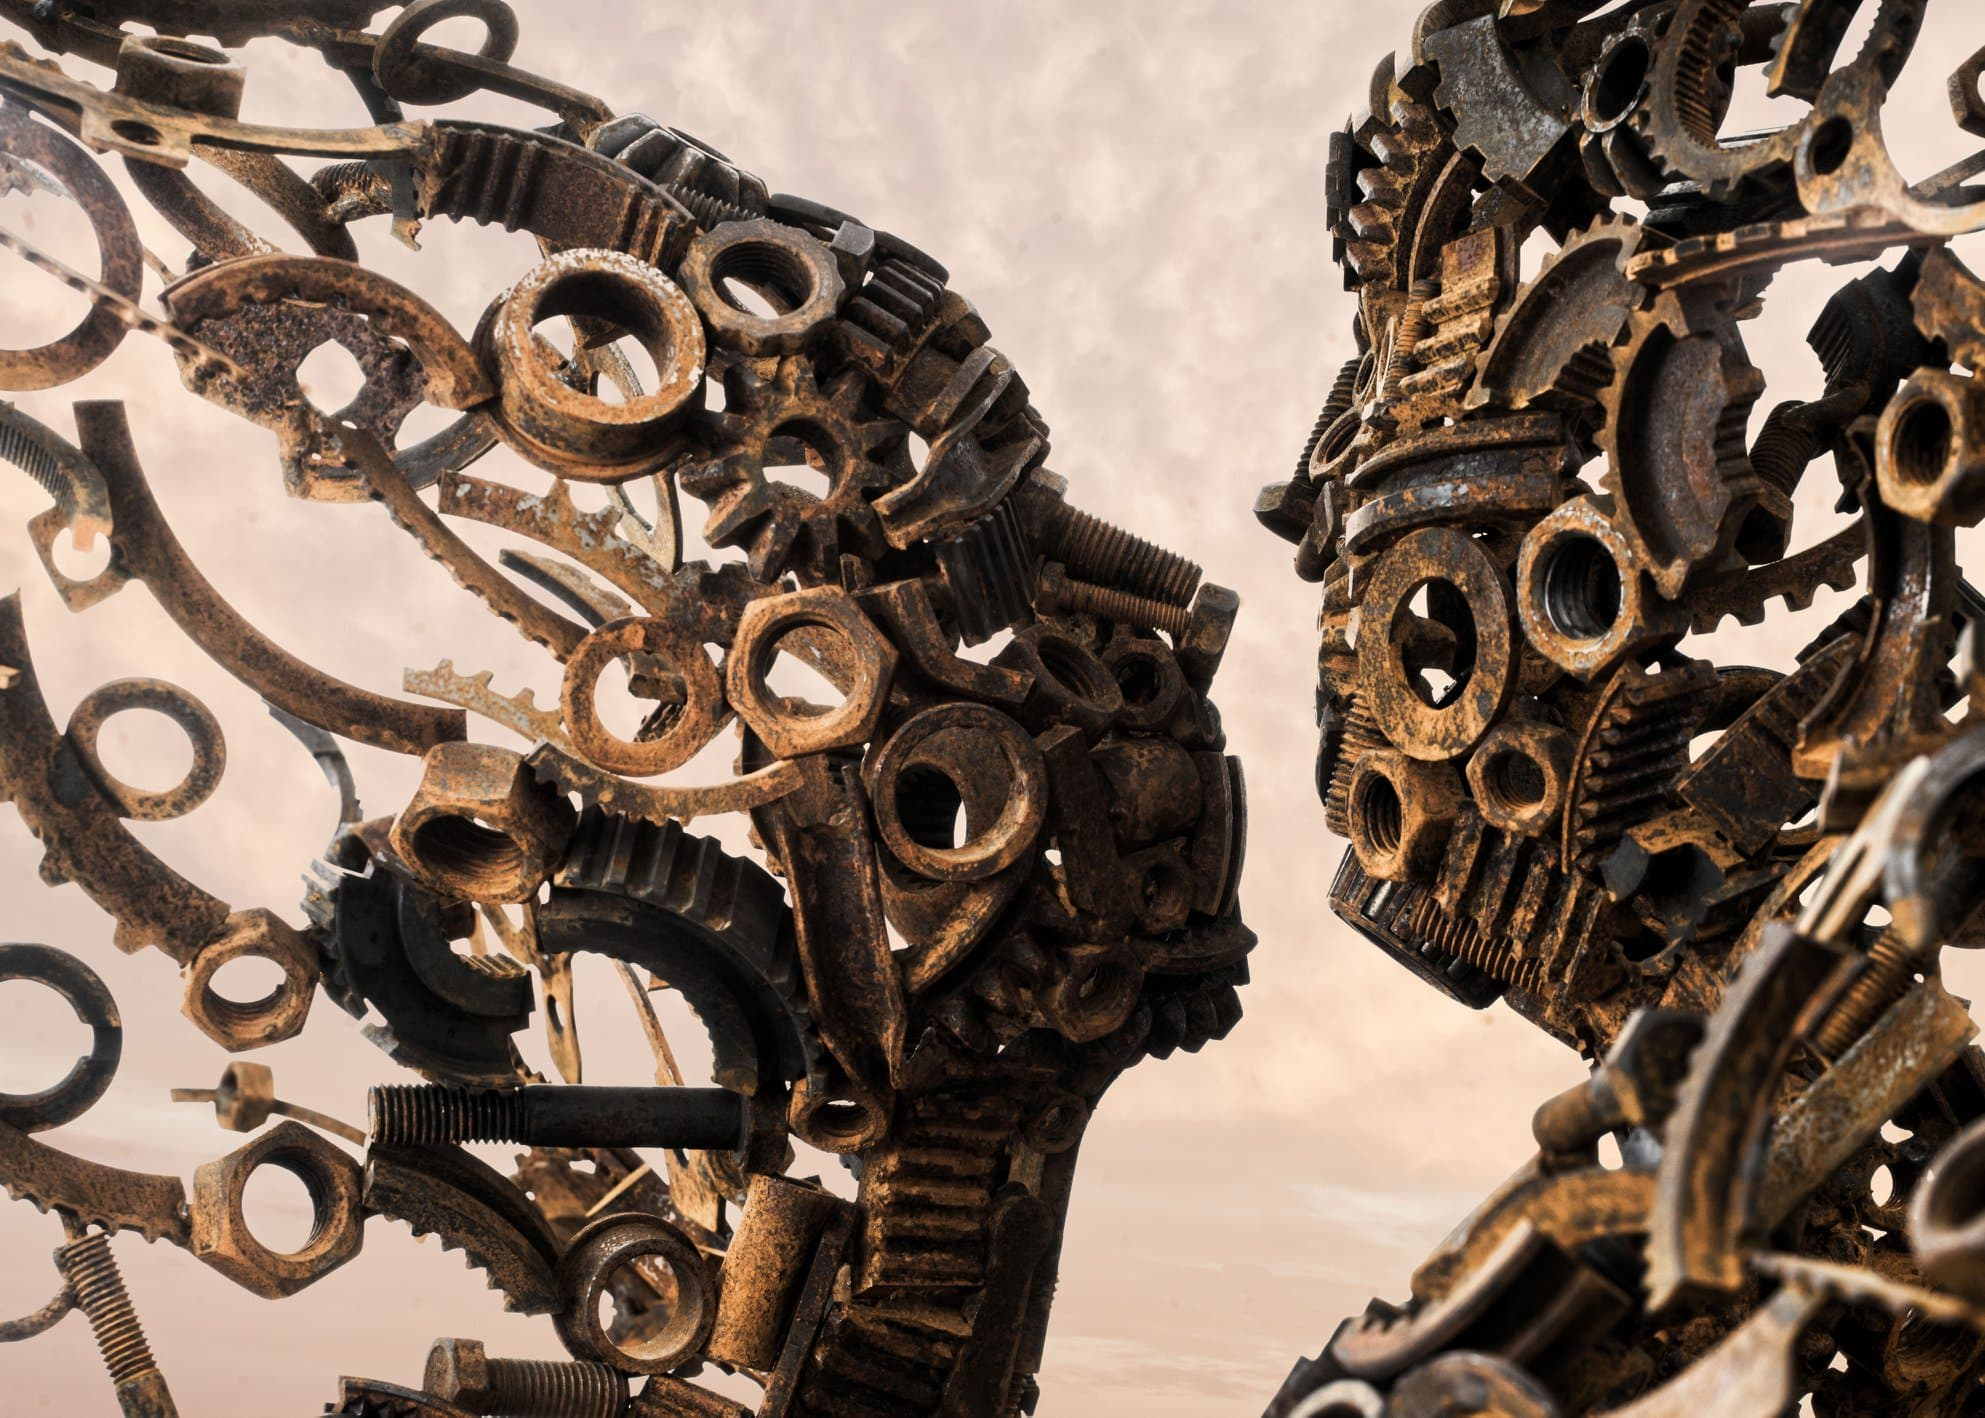 Penny Hardy - Blown Away - Menschliche Skulpturen aus alten Maschinenteilen